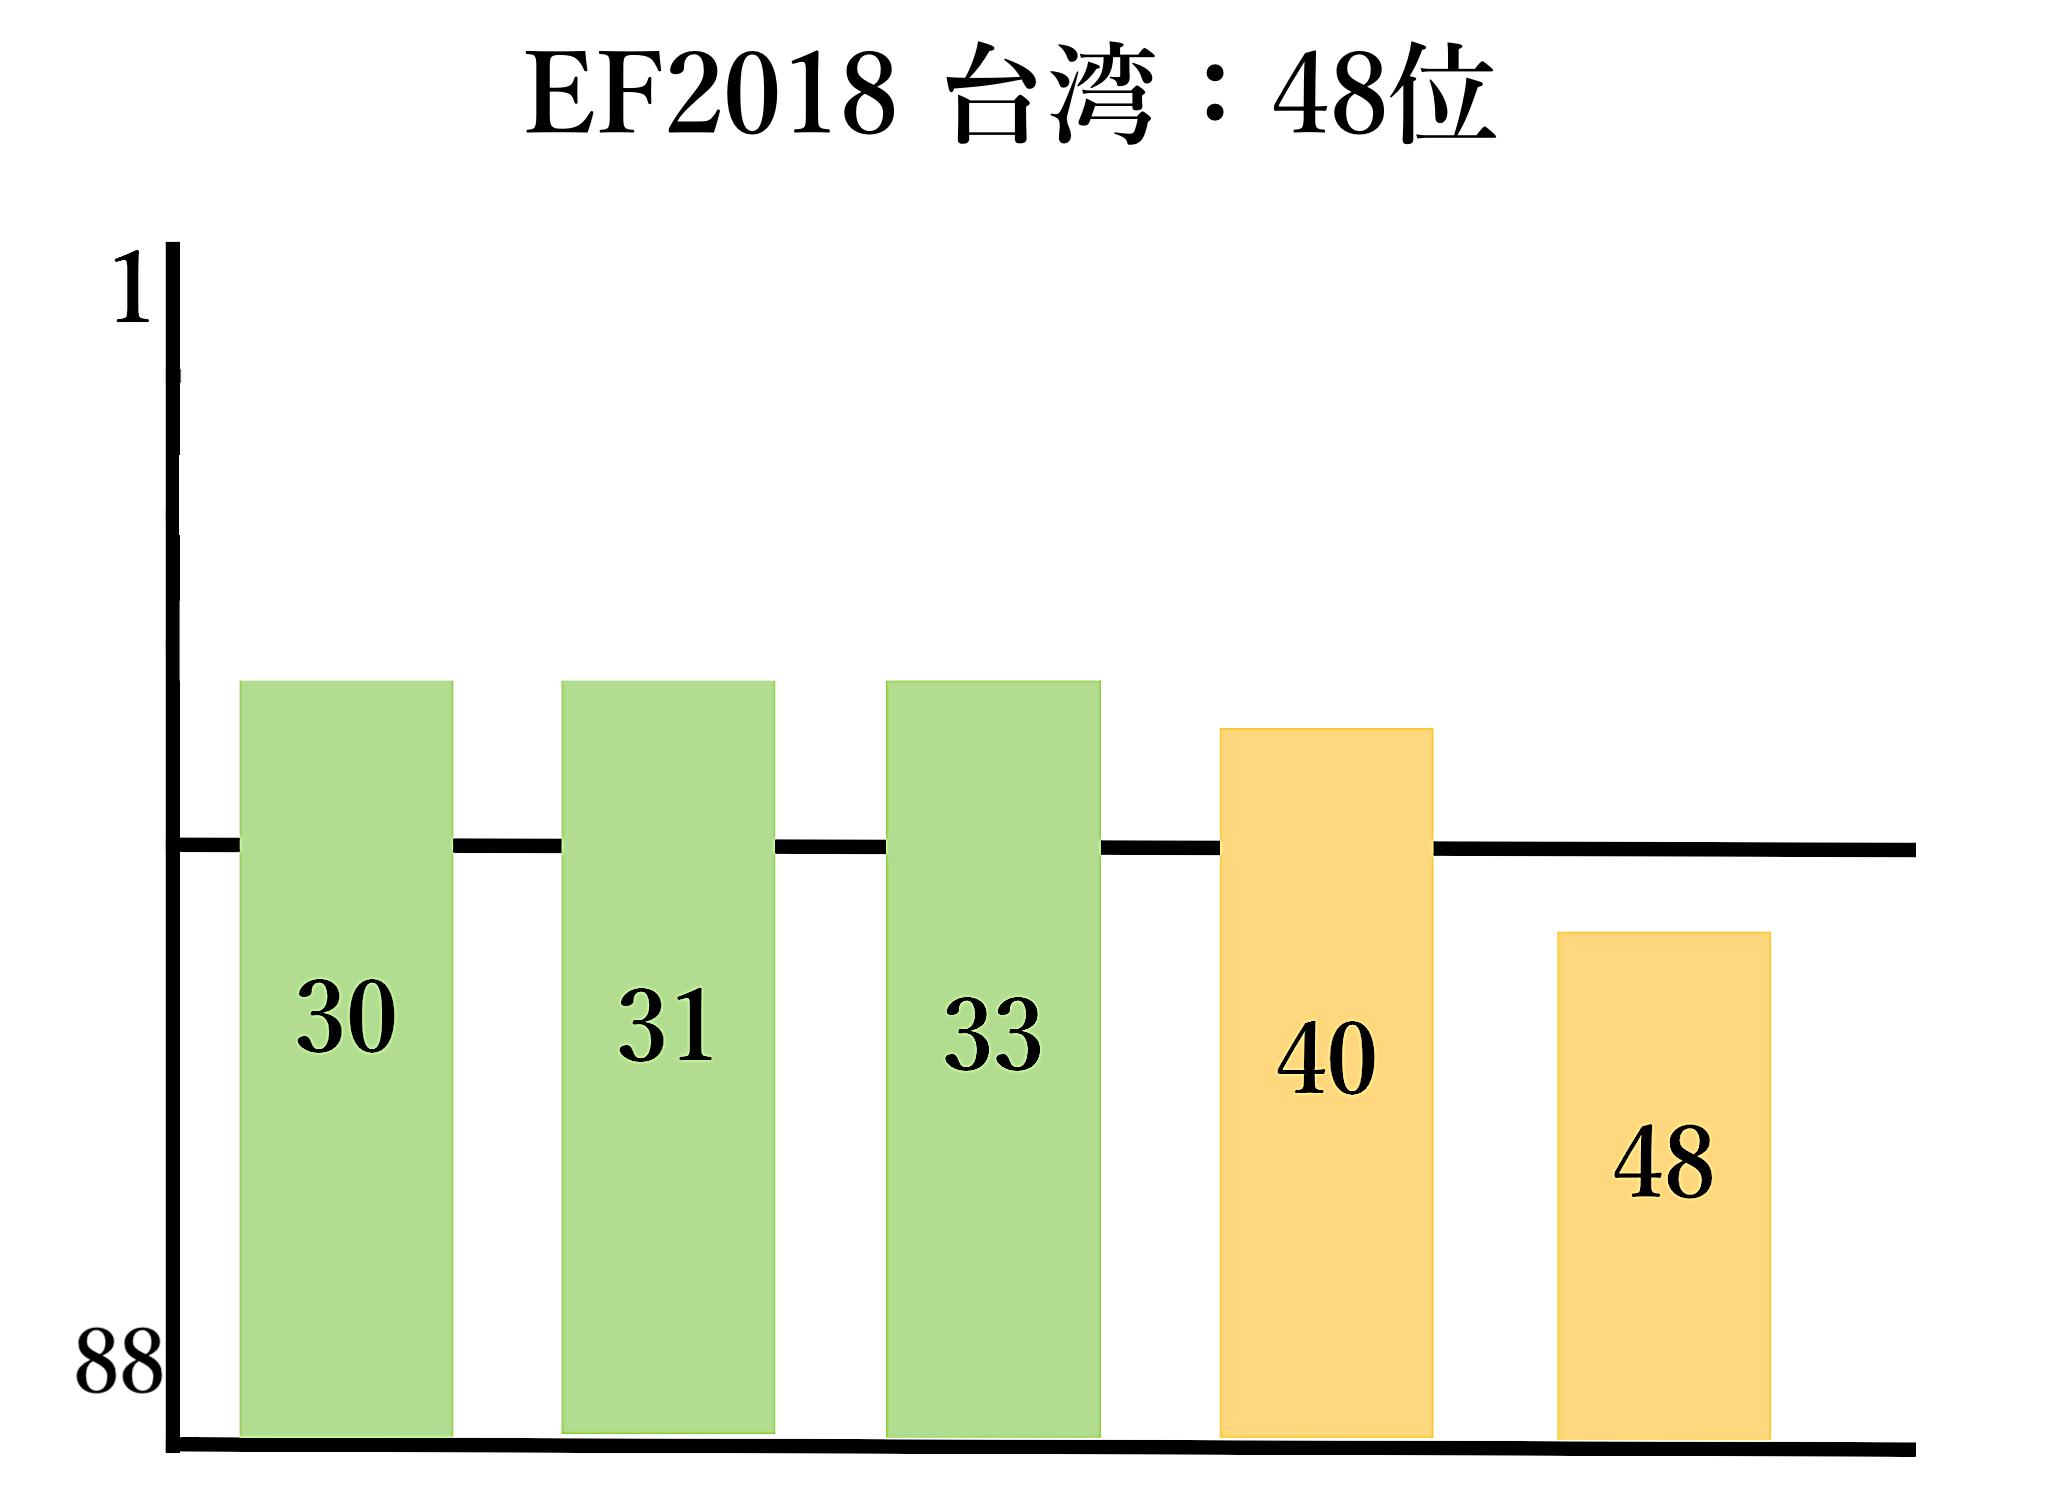 EFデータを元にした台湾英語能力の推移グラフ(筆者自作)